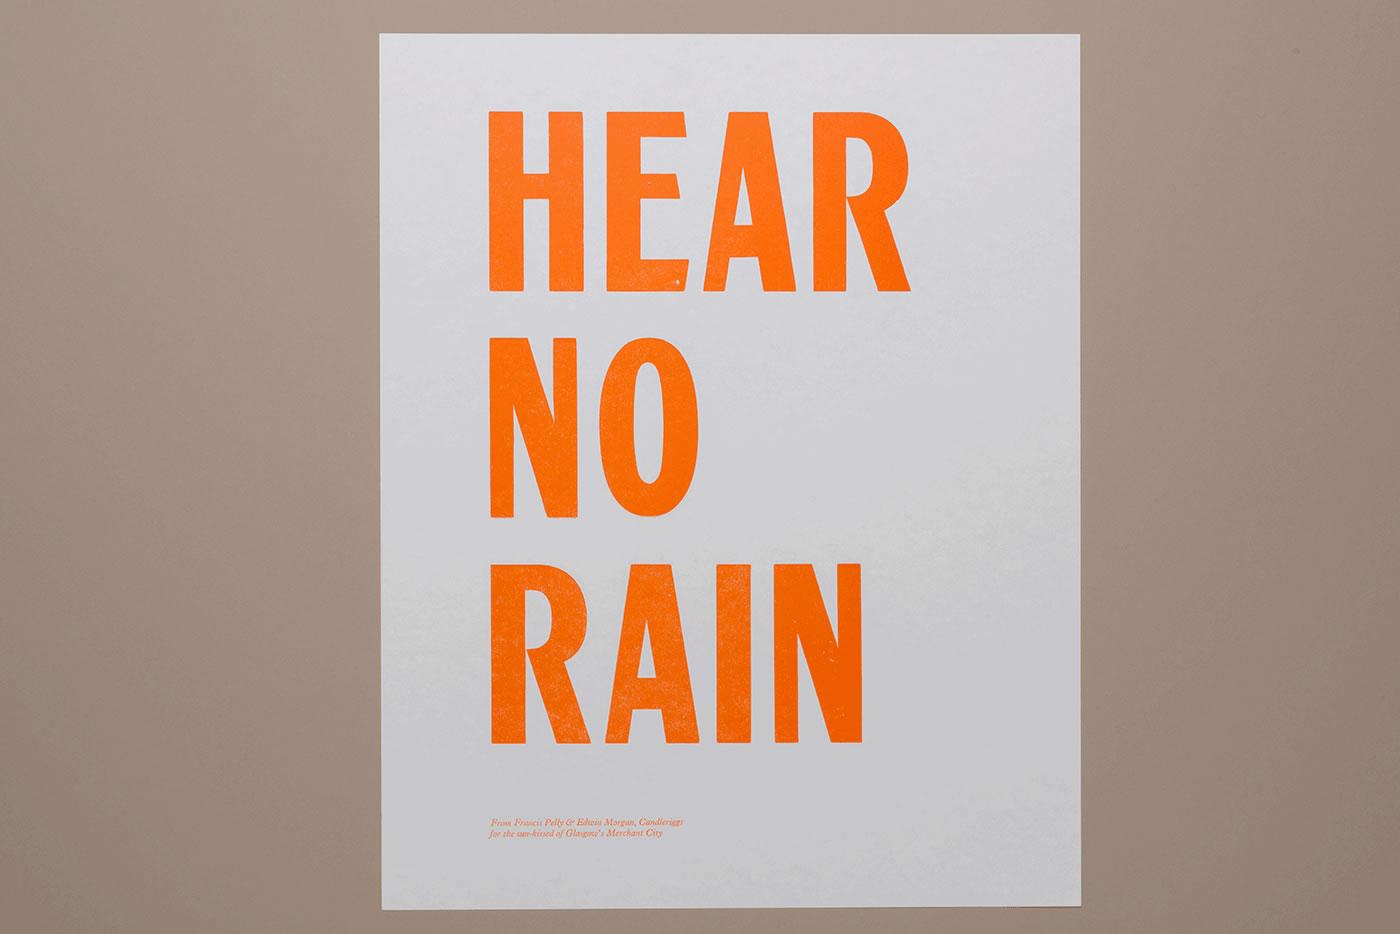 Hear No Rain